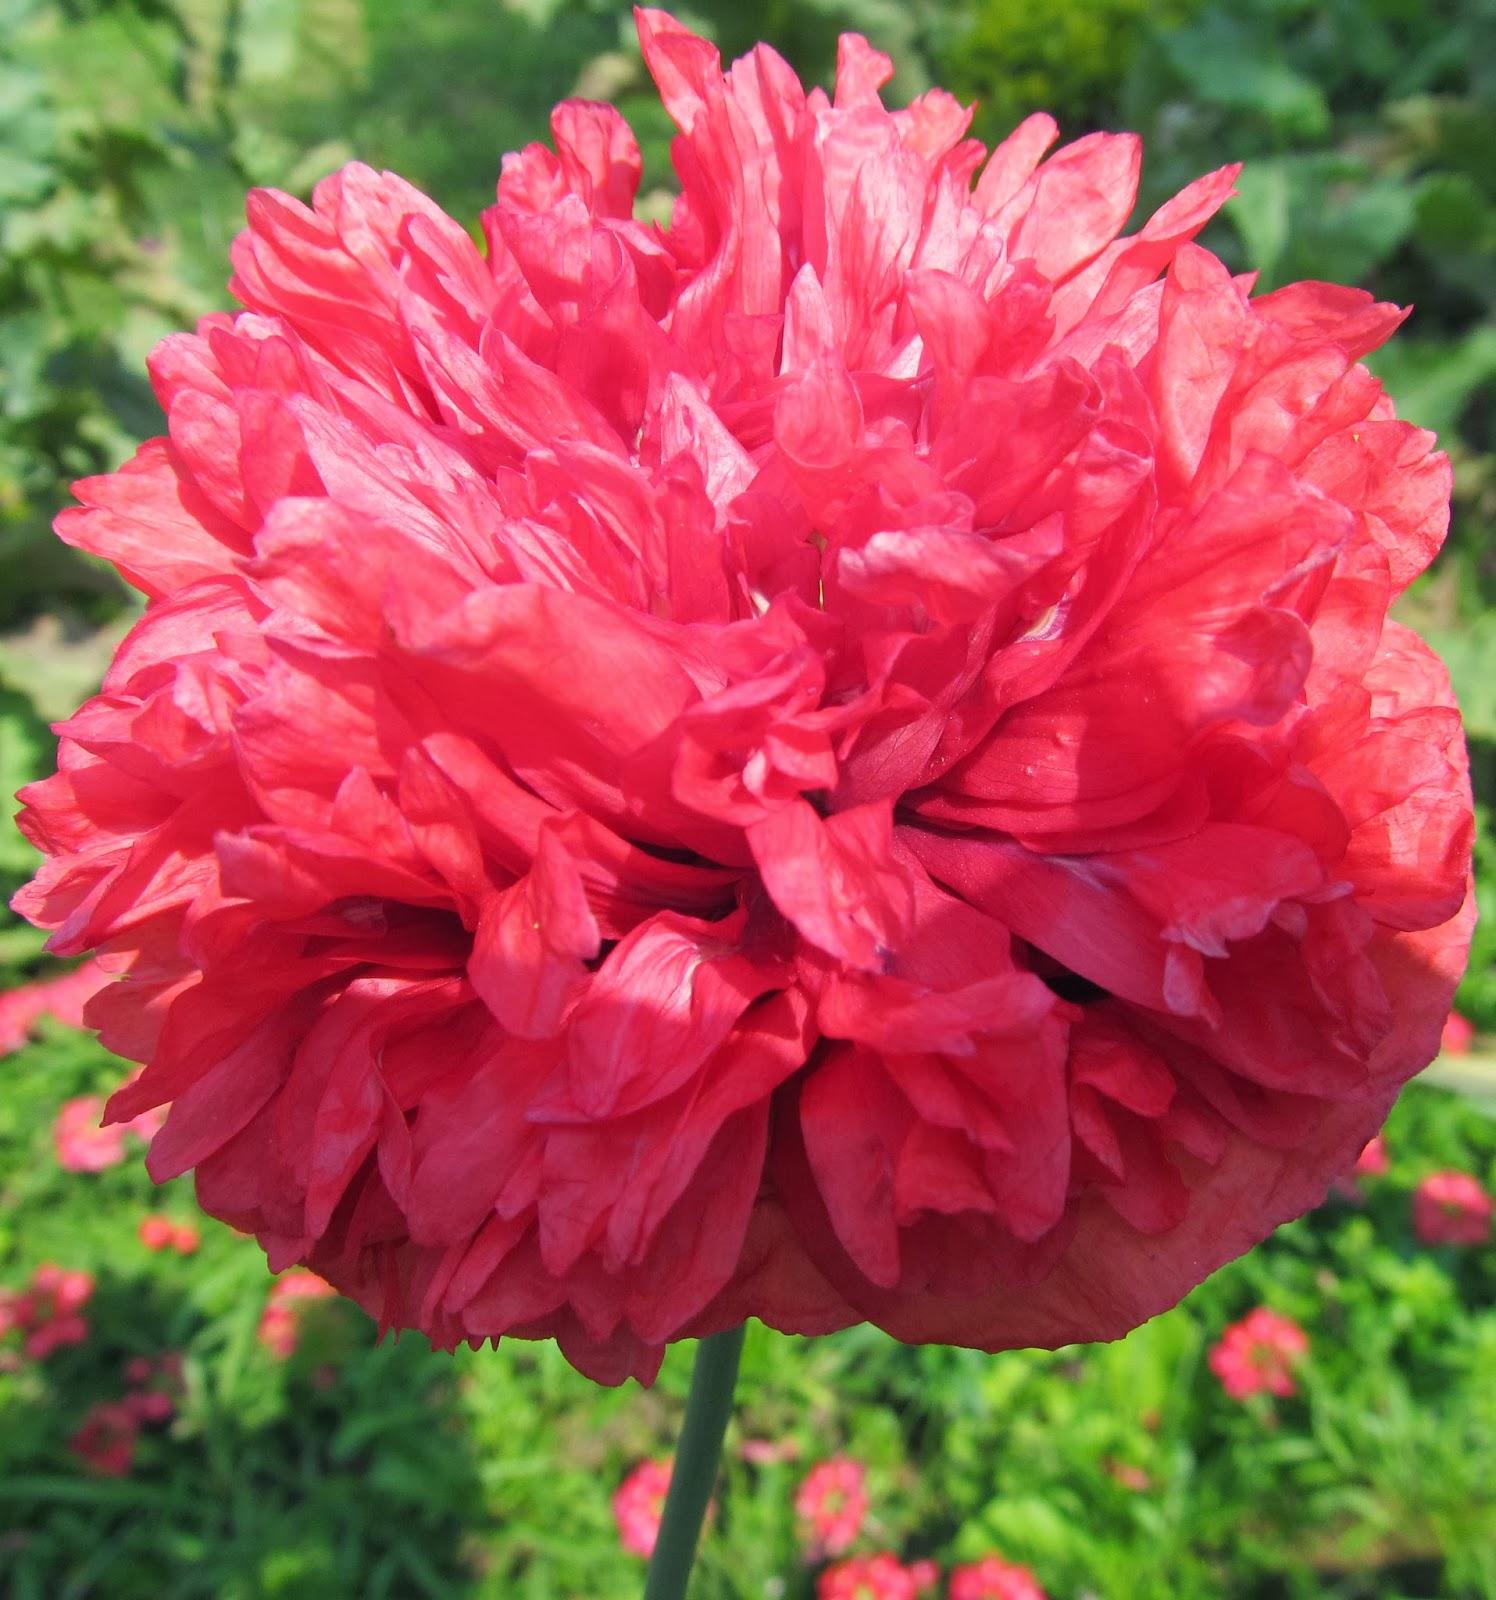 DOUBLE RED PEONY POPPY FLOWERRed Peony Flower